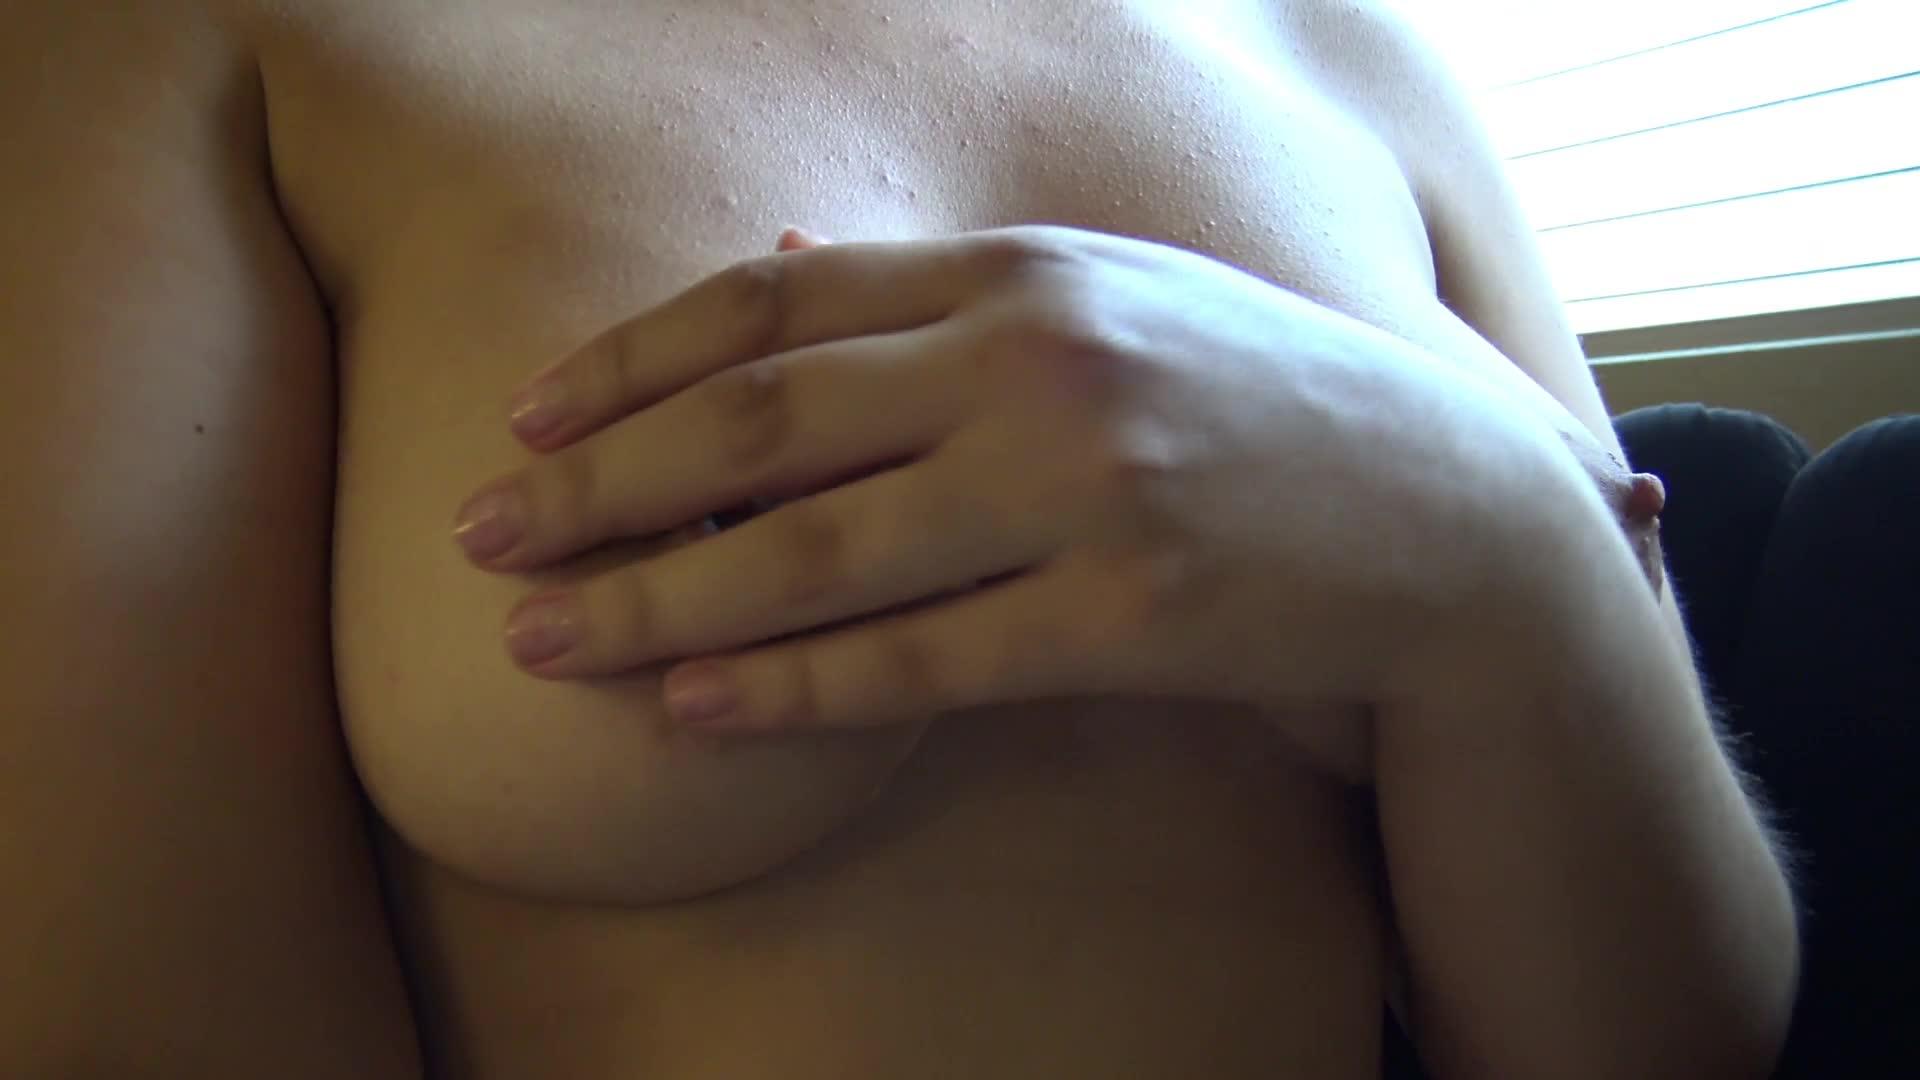 """Dani Sorrento"" (Butt Plug, Dirty Talking, GFE, Masturbation, Nudity/Naked) GFE Body Tour, Butt Plug and Cum - ManyVids Production"